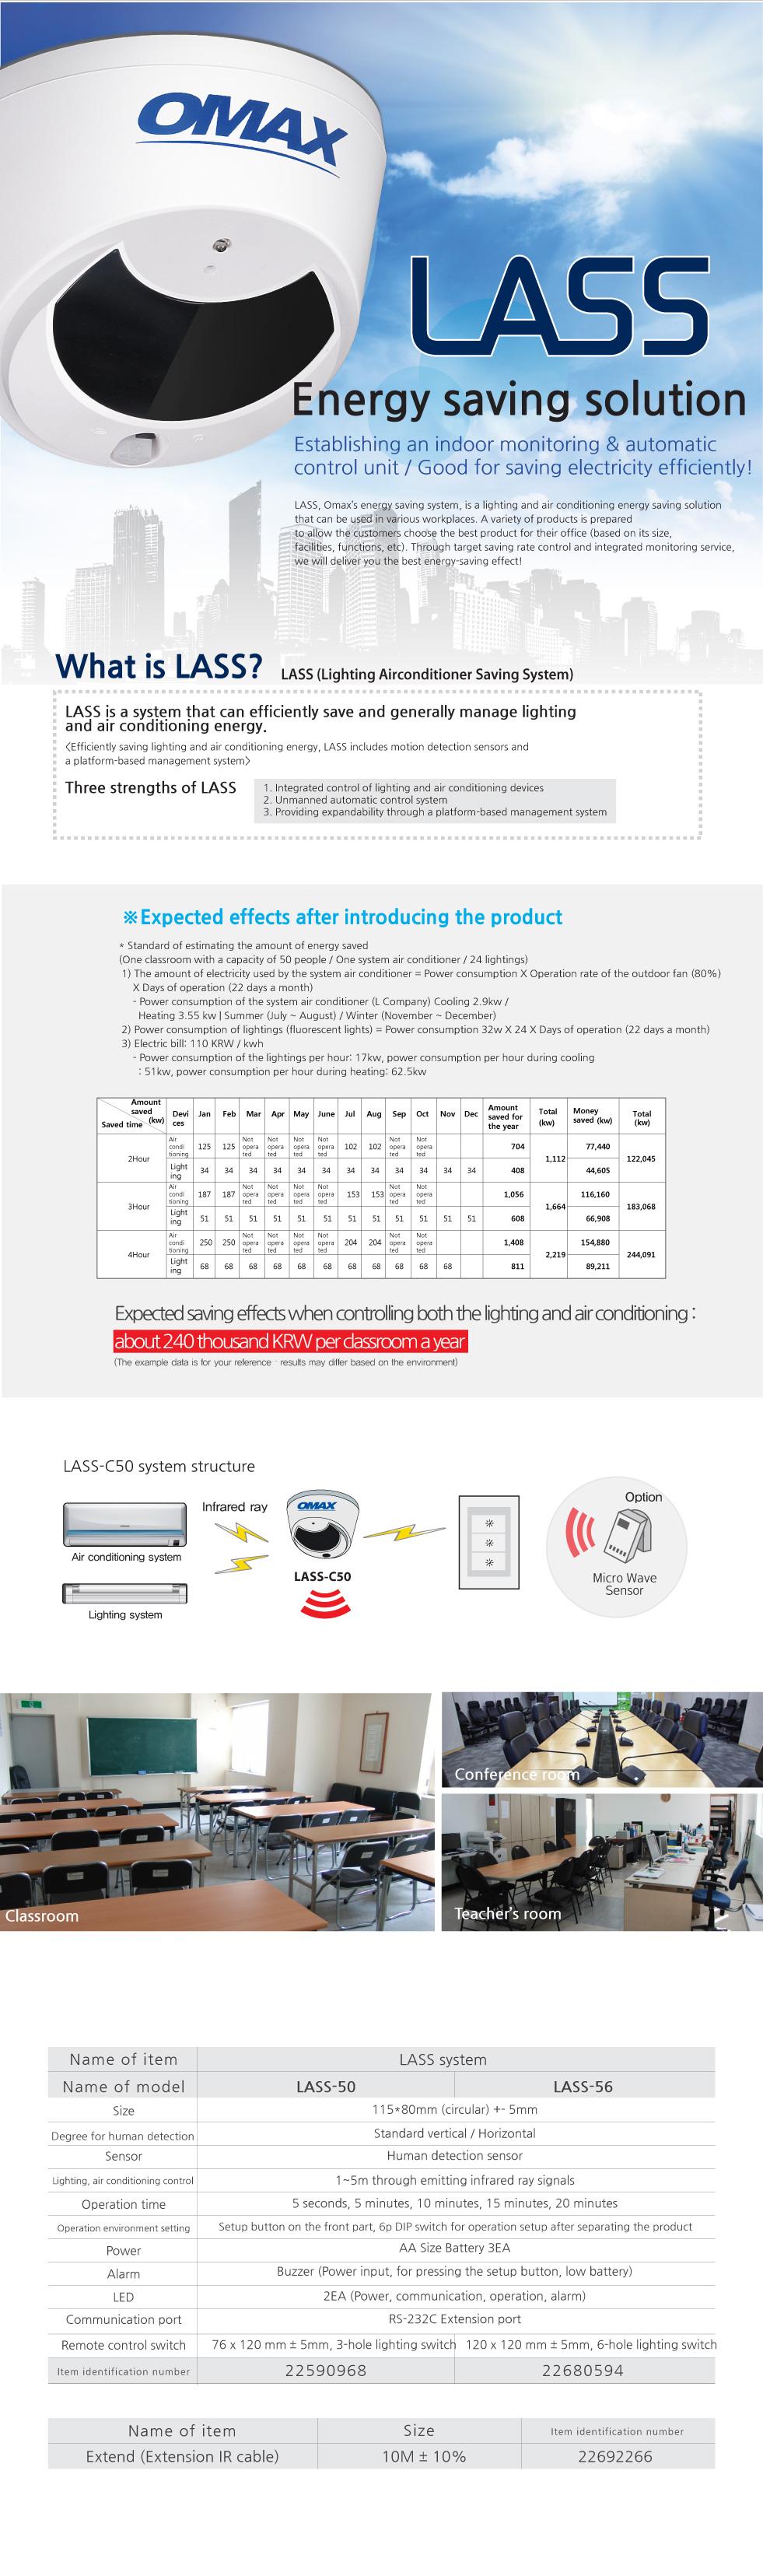 OMAX Lighting Airconditioner Saving System (LASS)